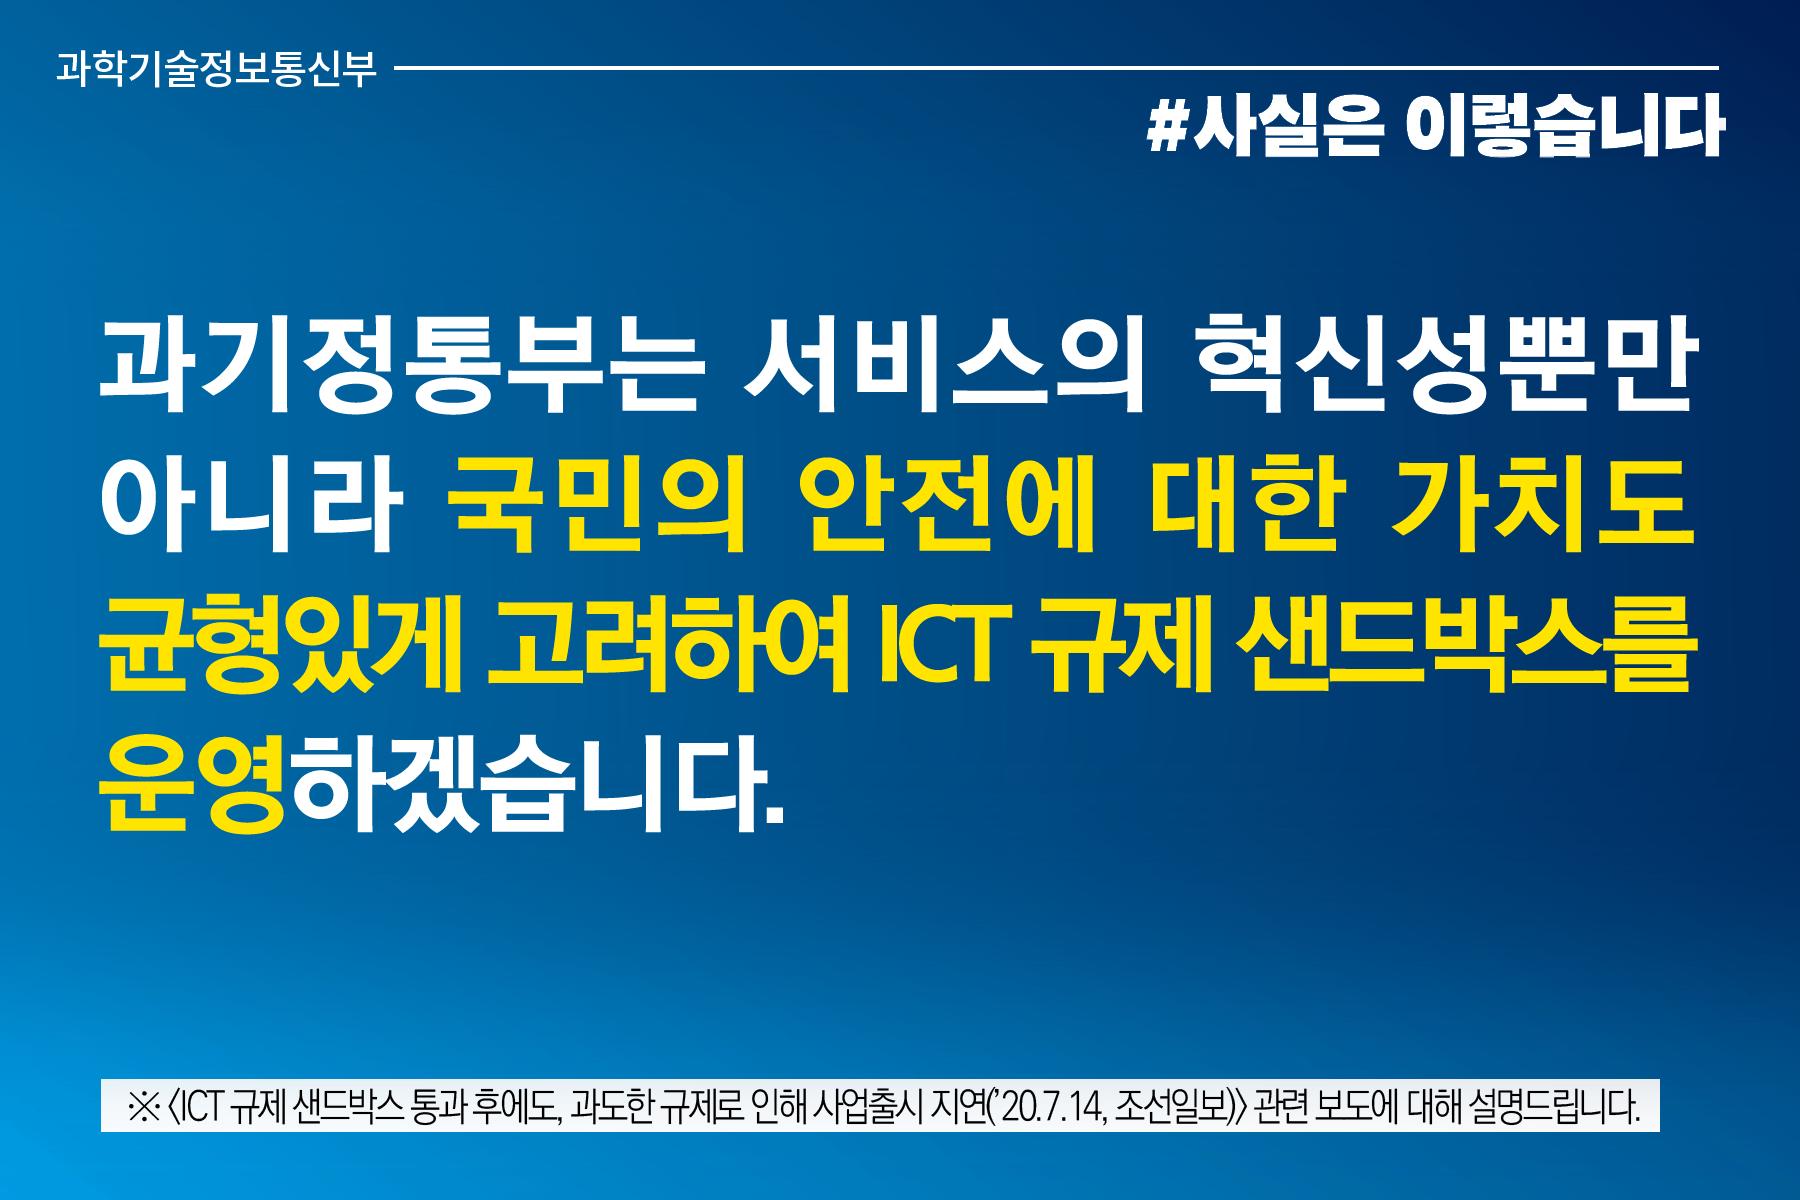 ICT 규제 샌드박스, 국민의 안전에 대한 가치도 균형있게 고려